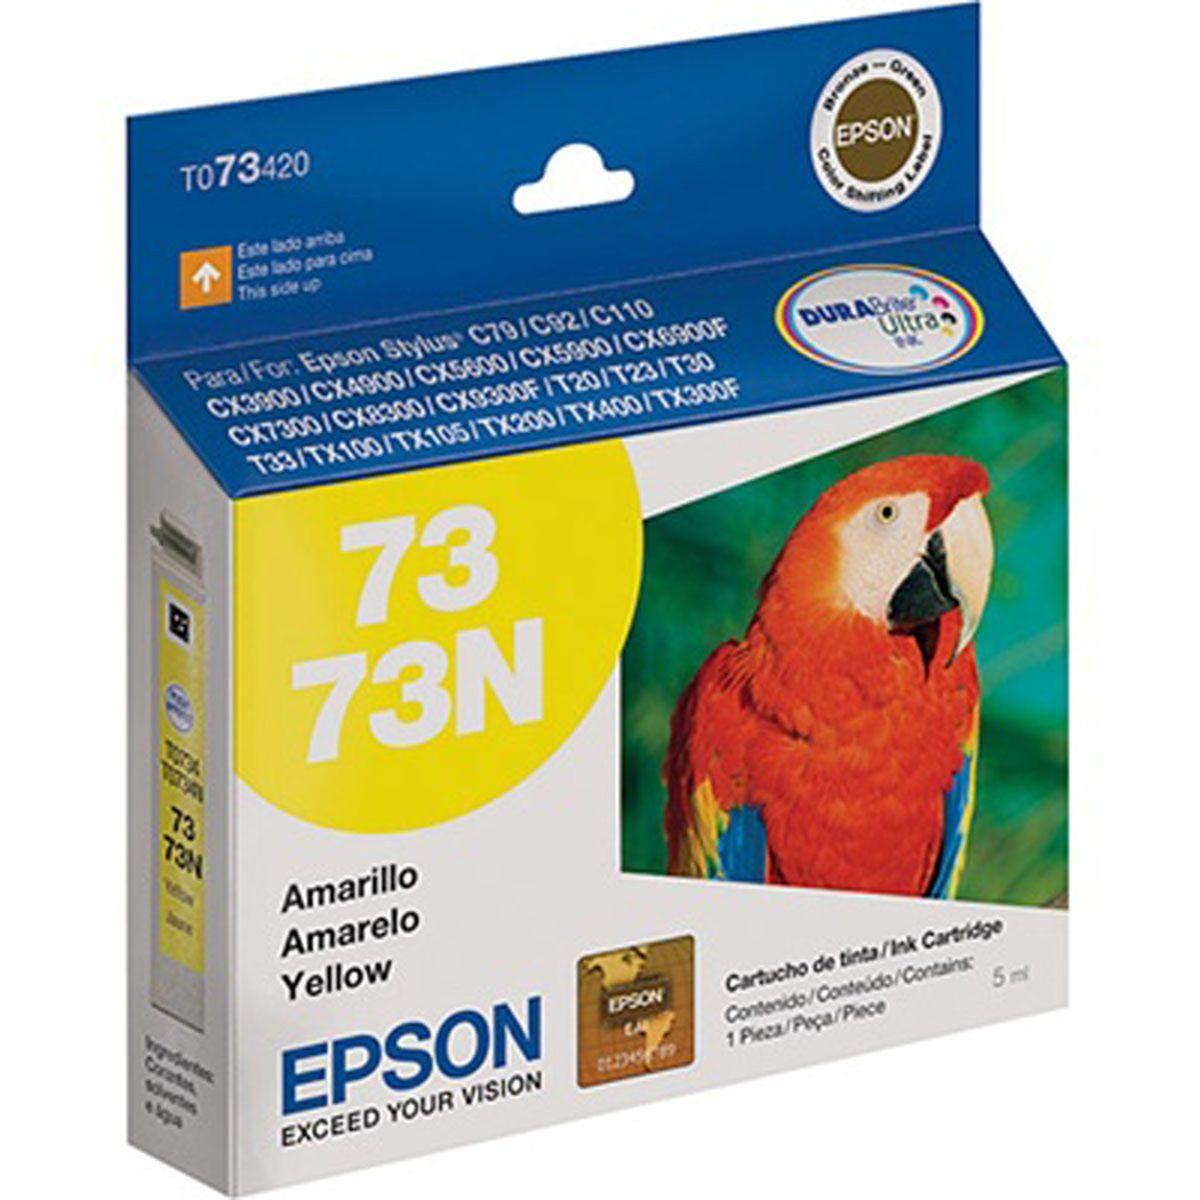 Cartucho Epson T073420 TO734N TO734 734 Amarelo para c79 C92 c110 cx5600 tx300 cx4900 T24 T33